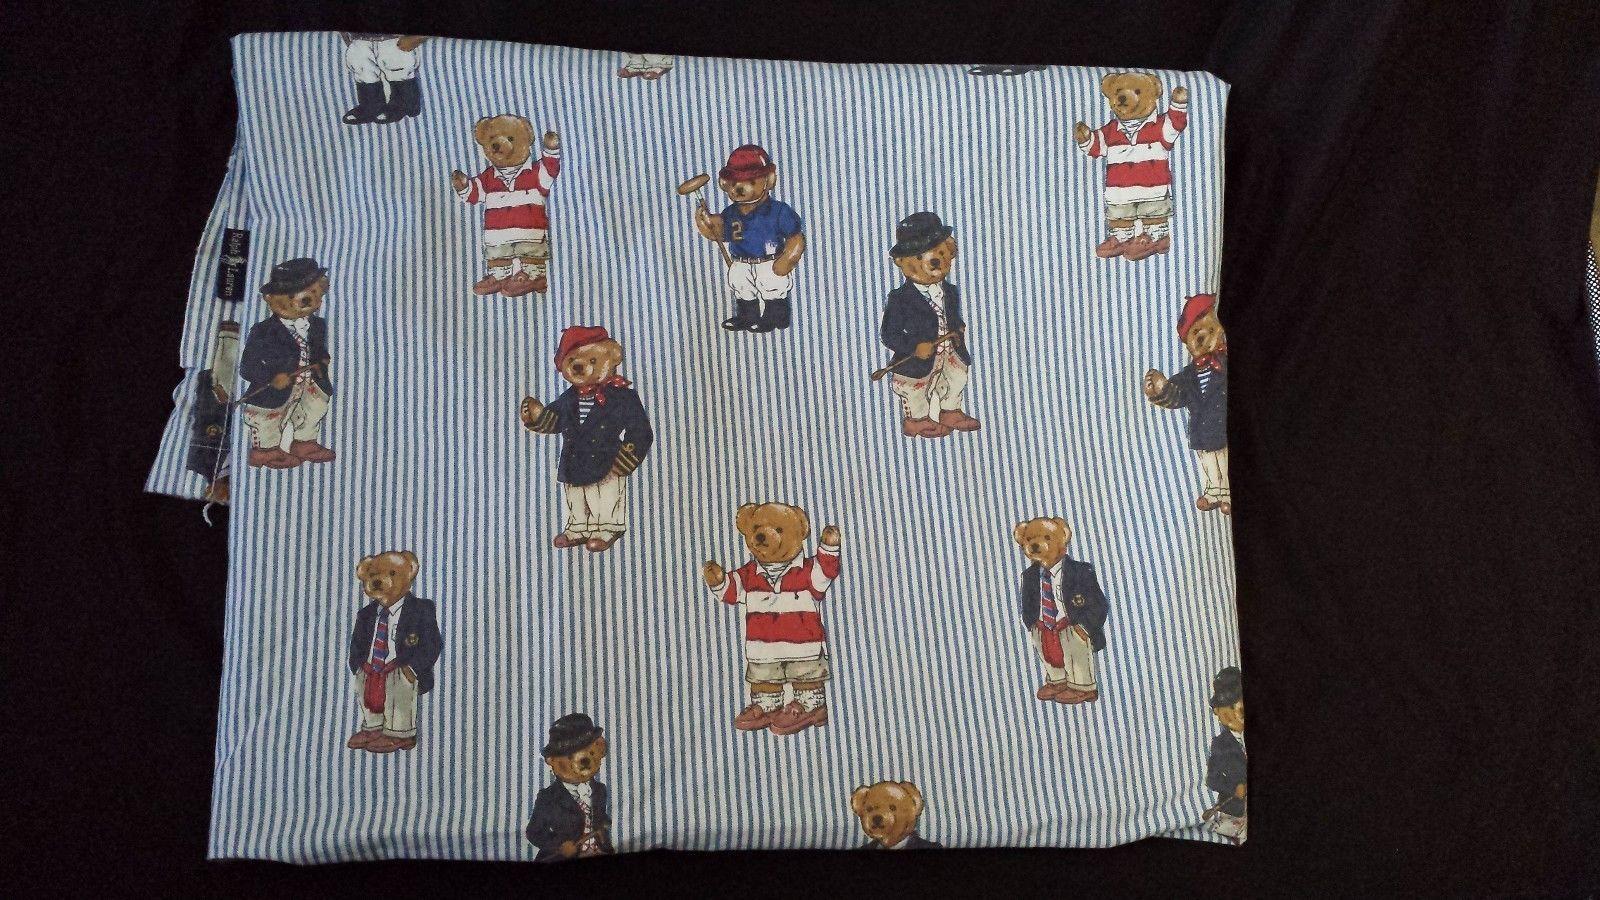 Flat Vintage Items 50 Bear Polo Teddy Ralph And Lauren Similar TcK1l3uJ5F